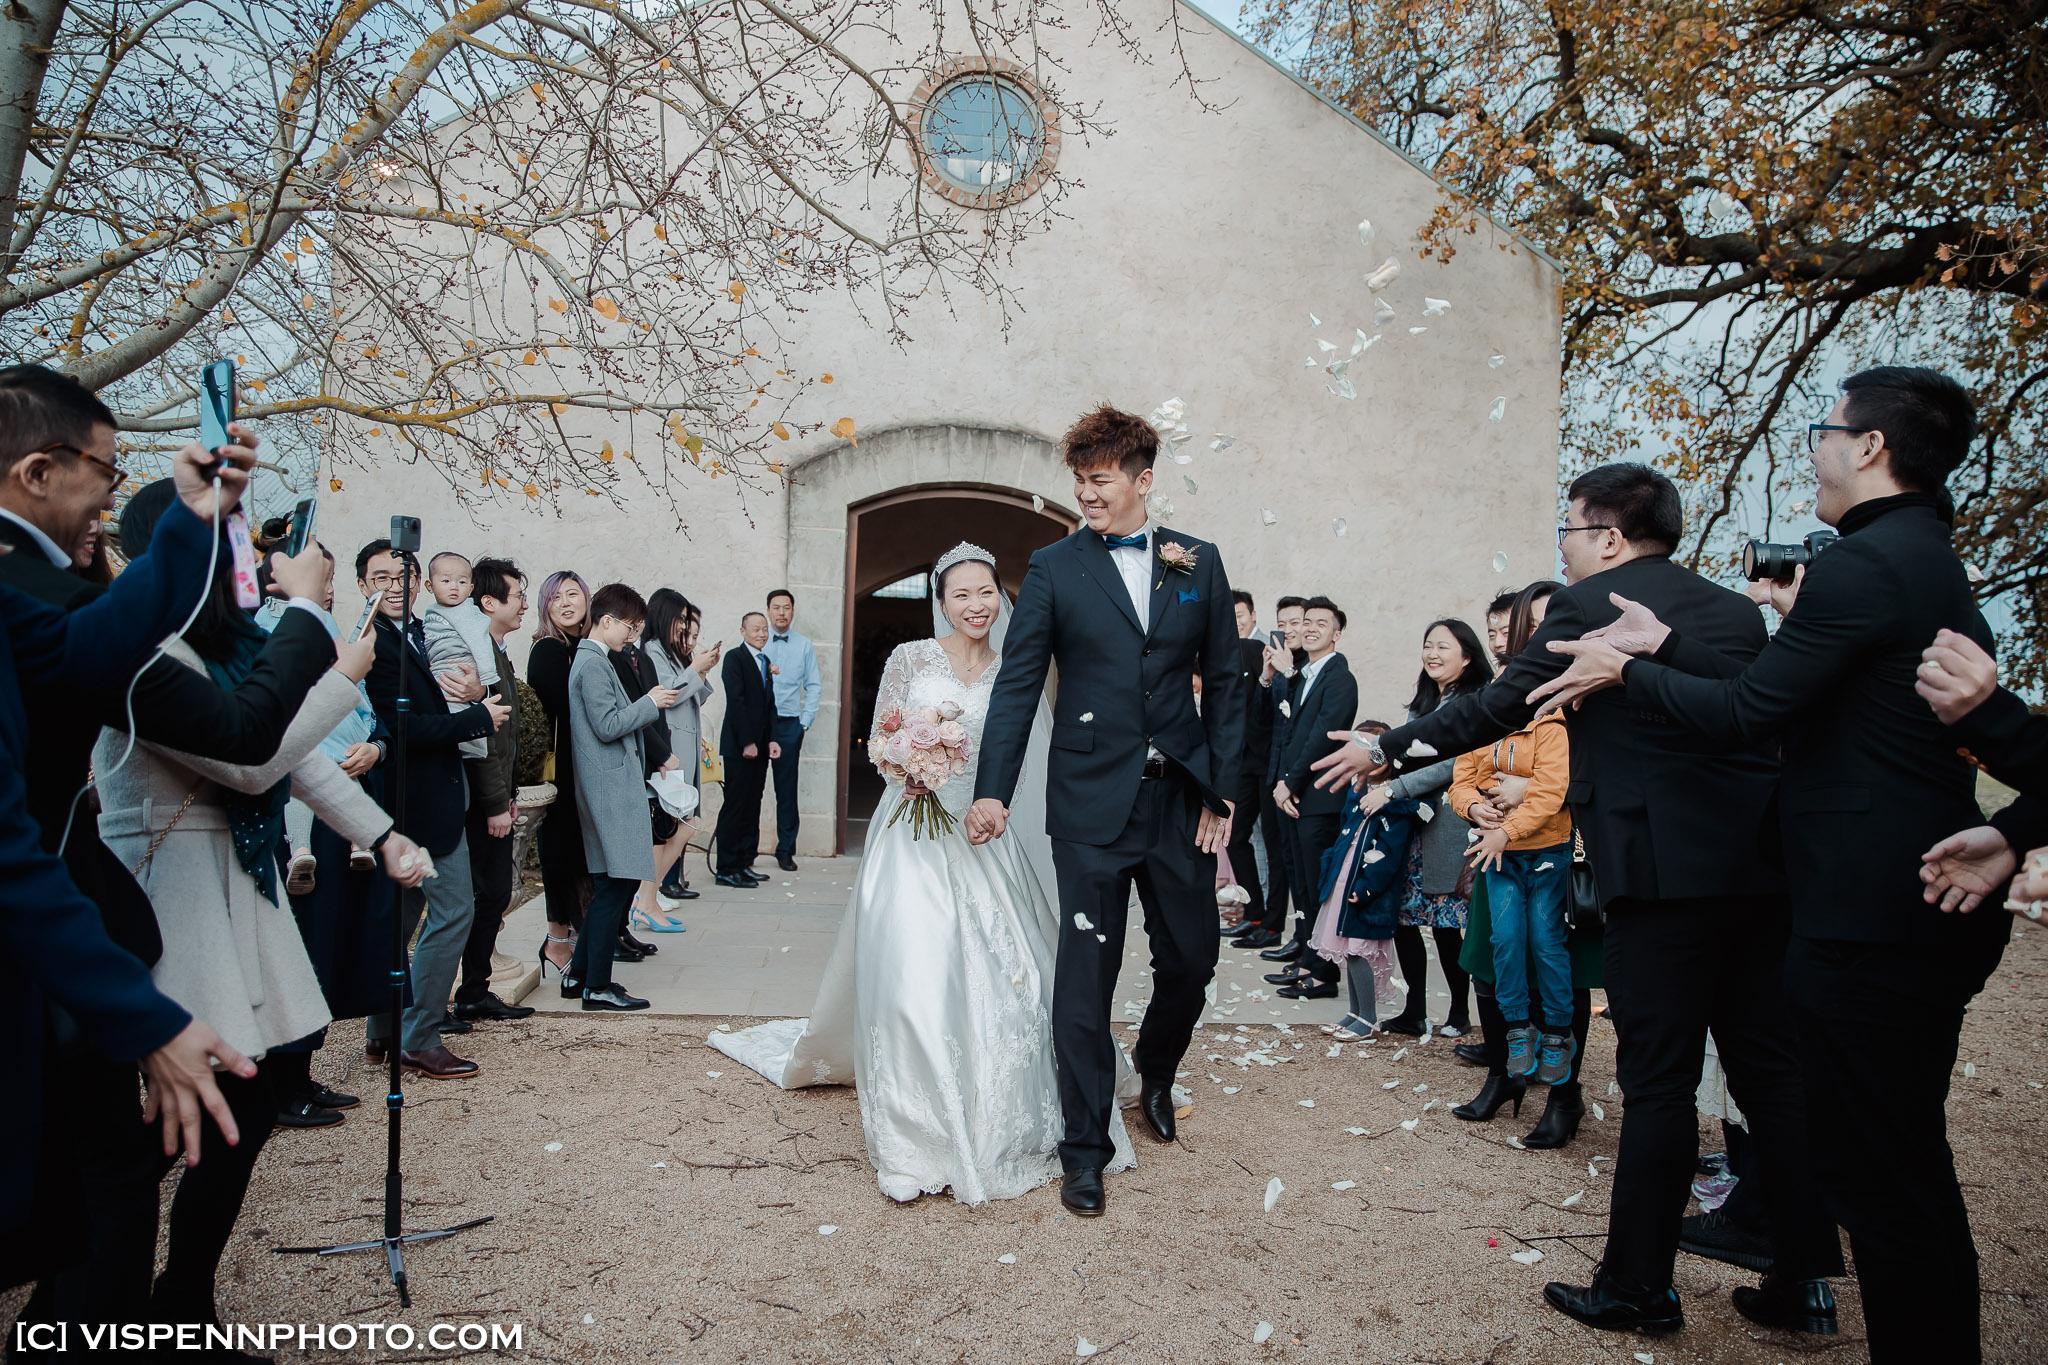 WEDDING DAY Photography Melbourne CoreyCoco 3P 08704 1DX ZHPENN